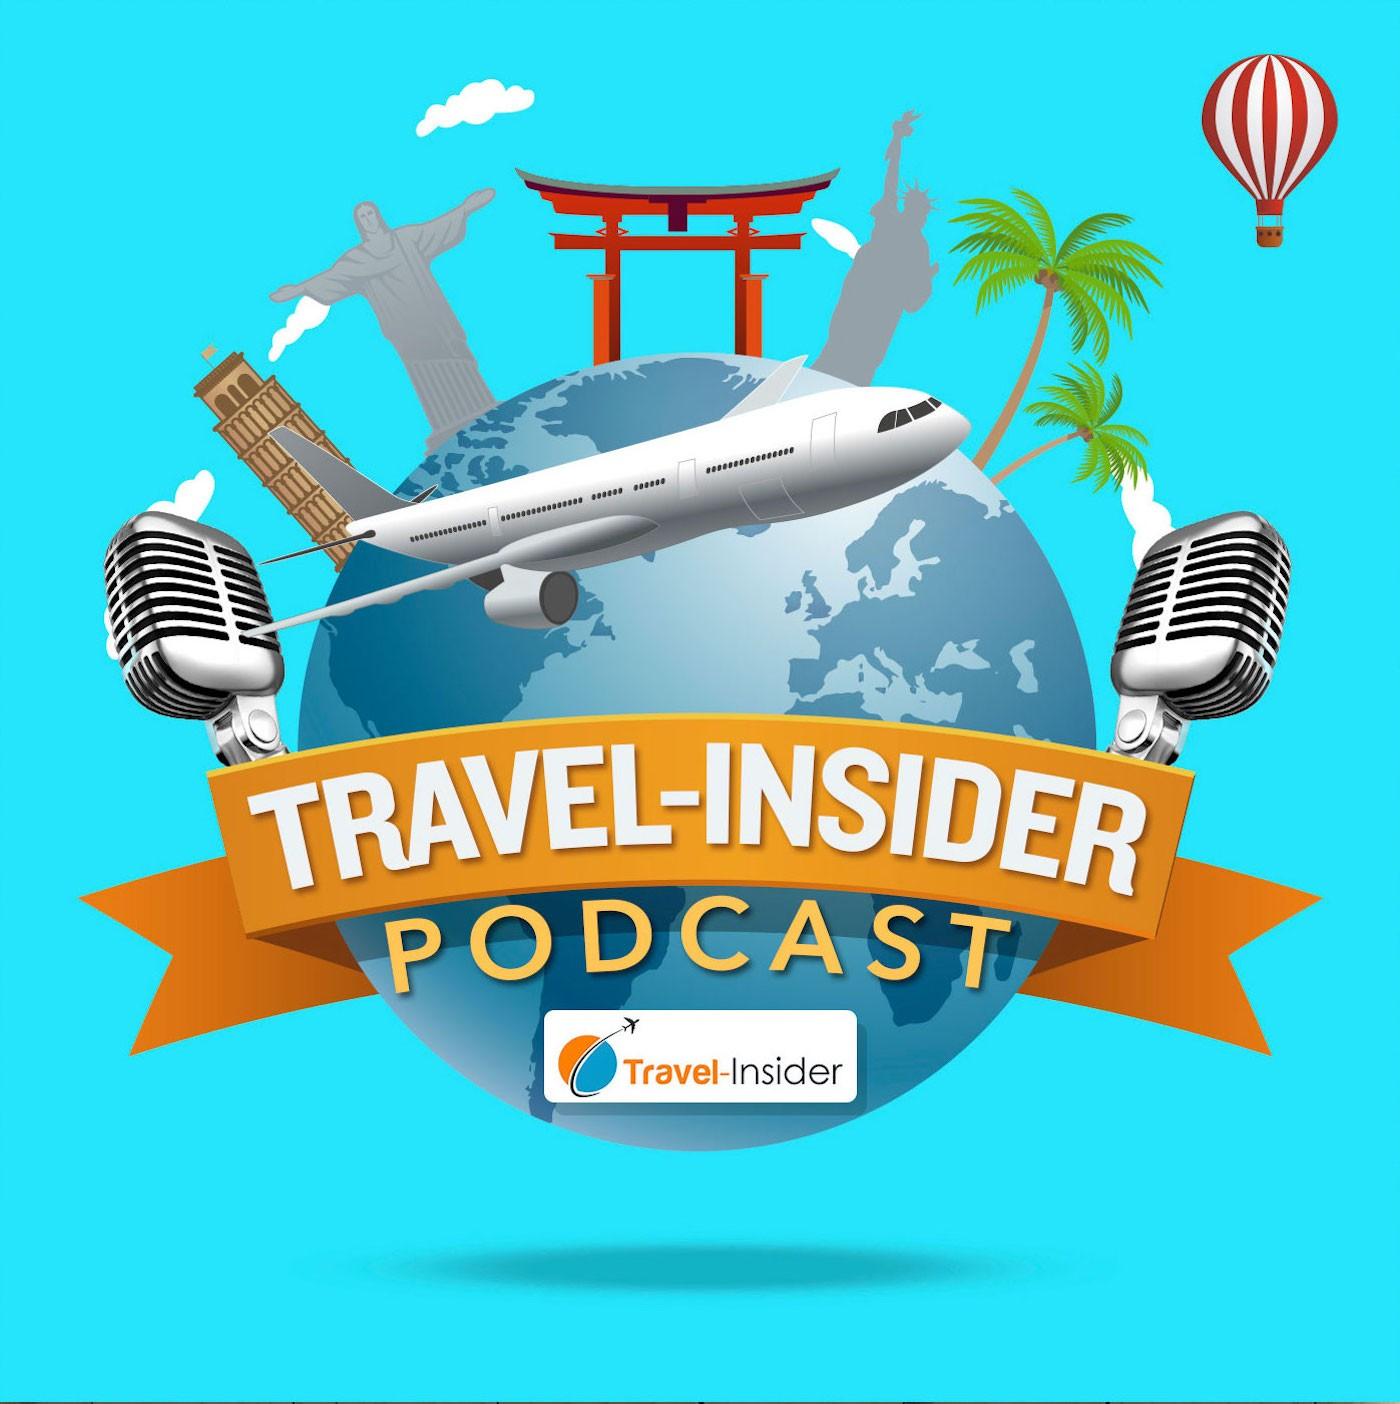 Jubiläum: 1 Jahr Travel-Insider Podcast